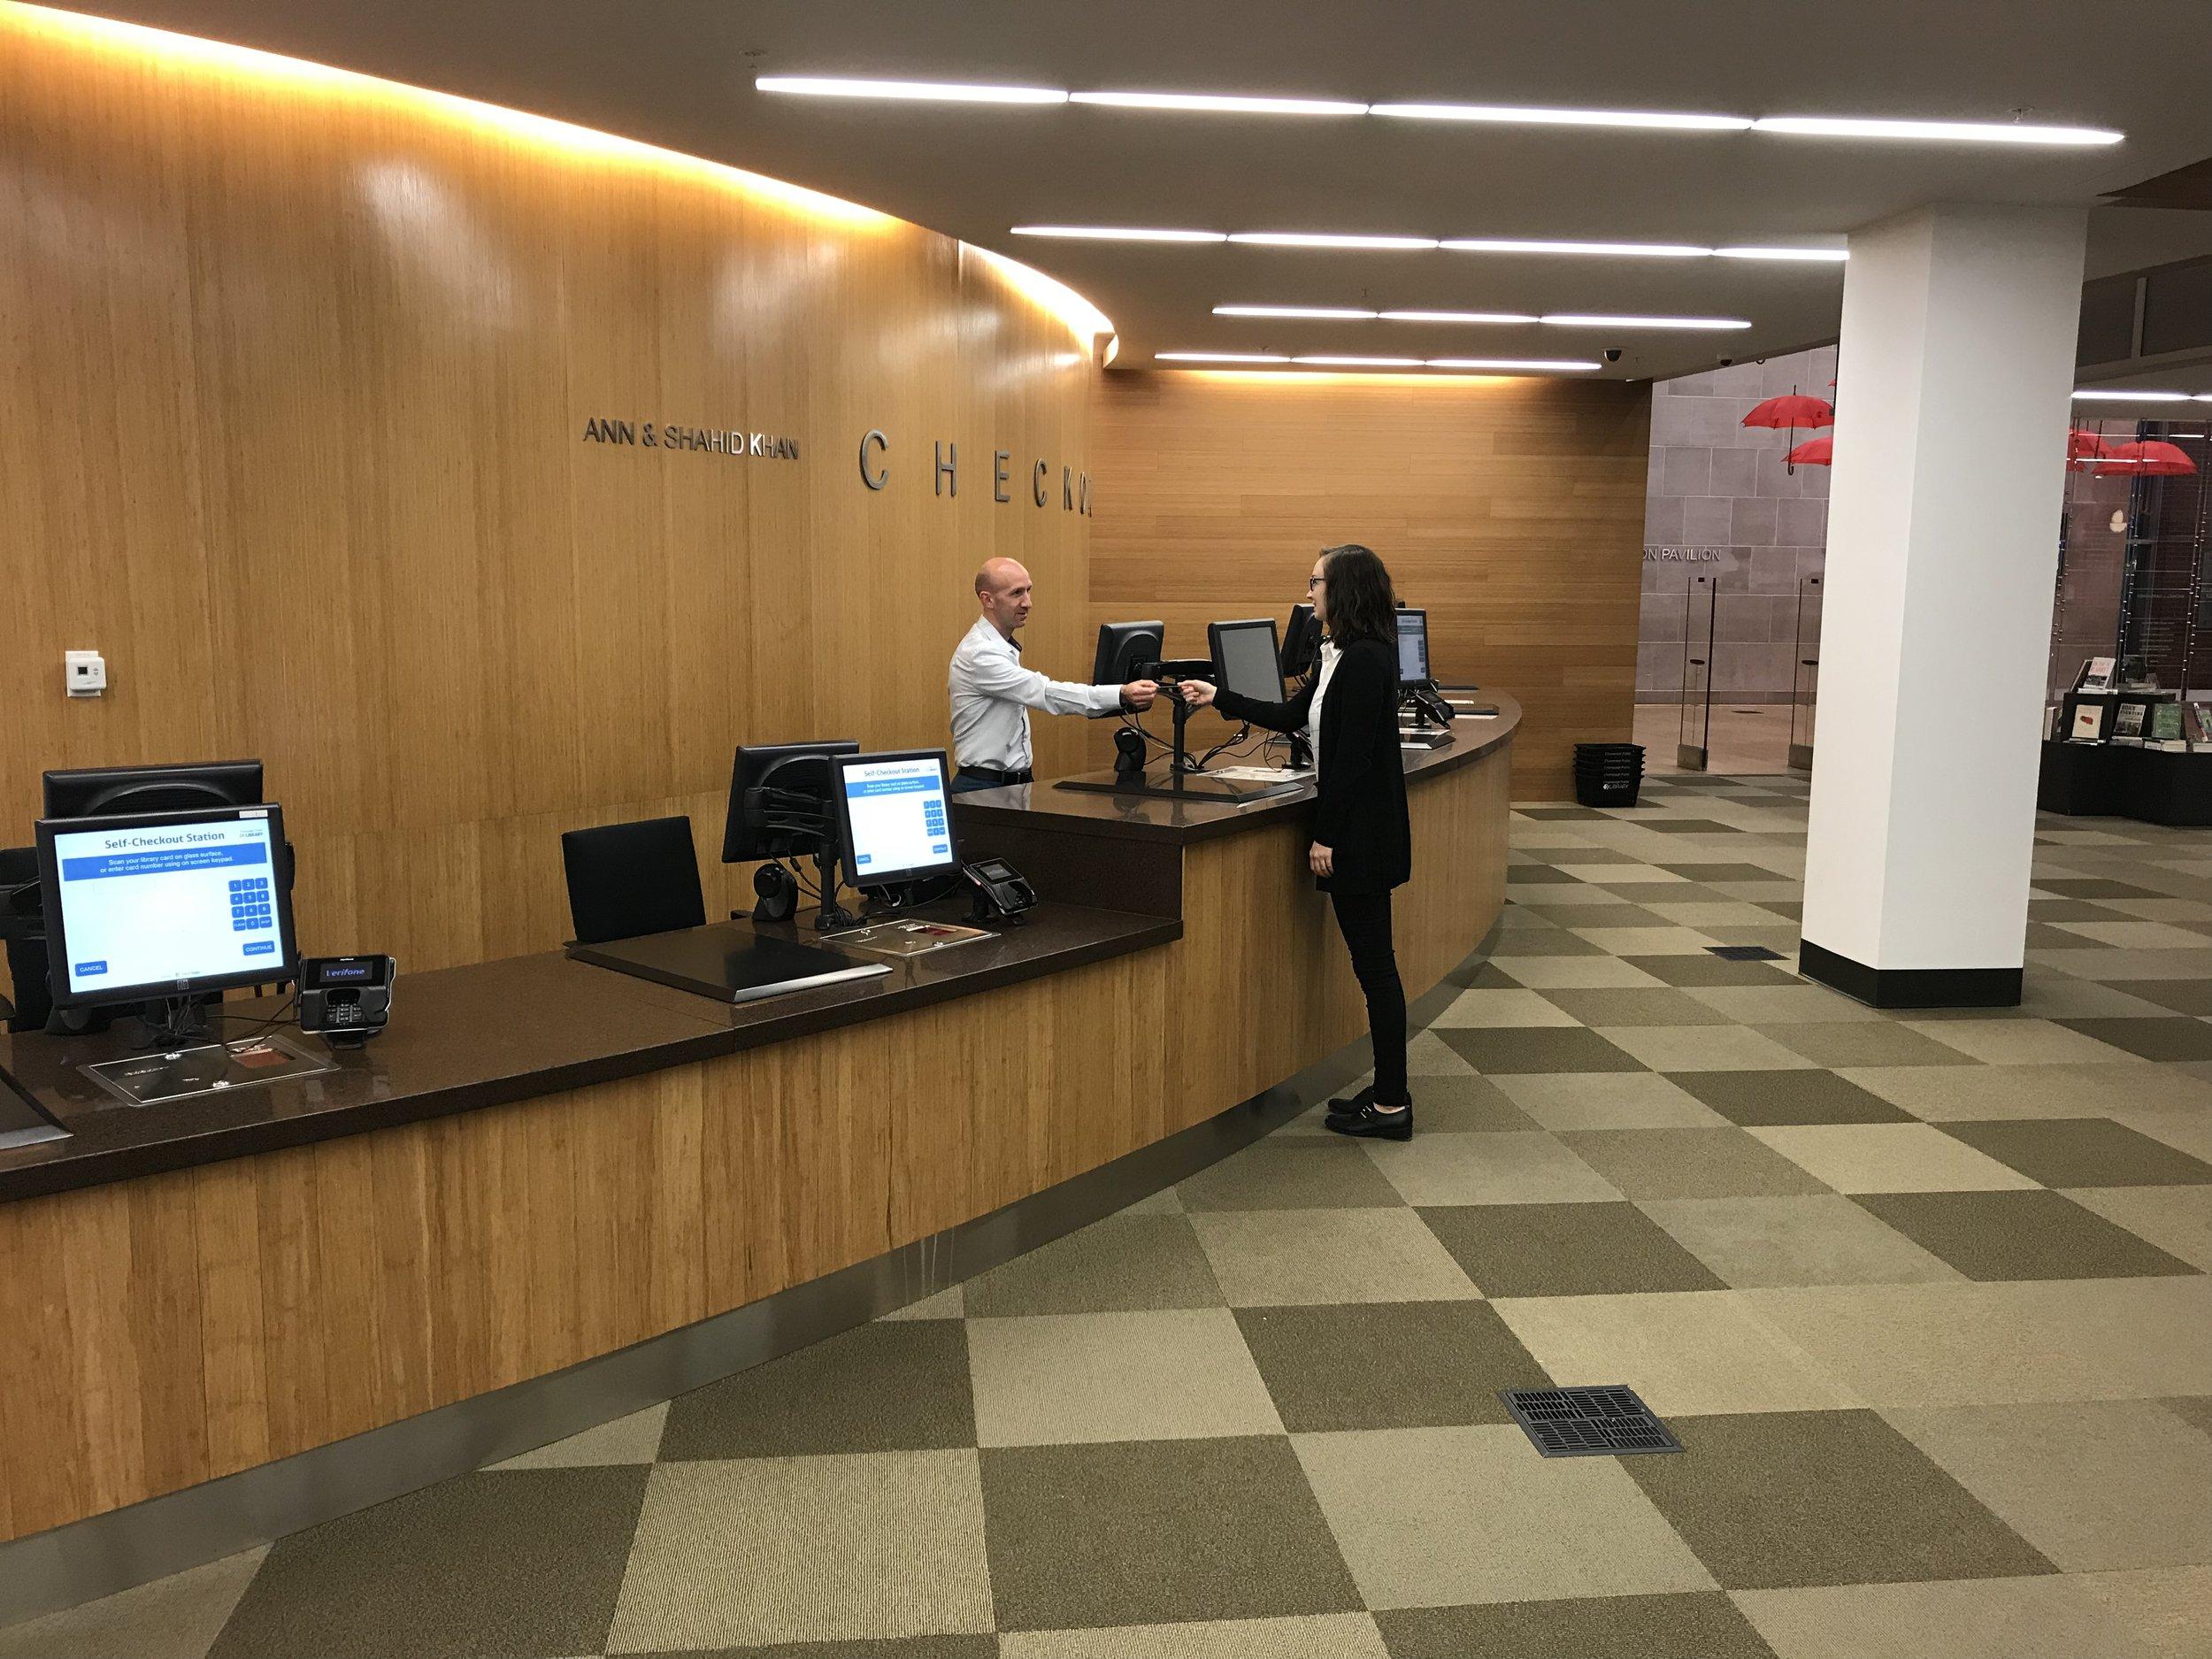 Ruairi McEnroe assists a customer at the Champaign Public Library.